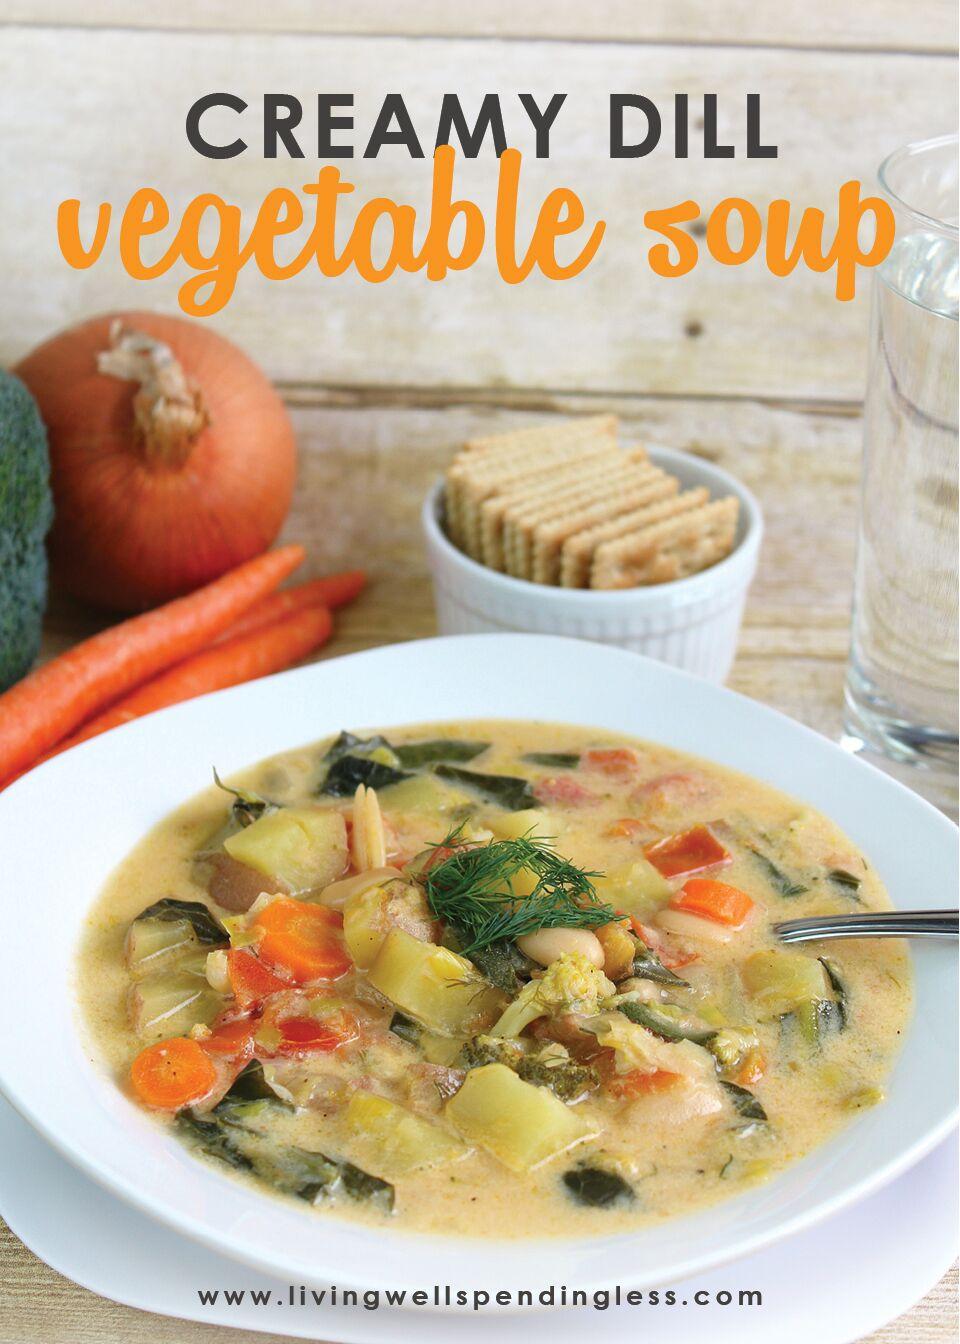 Creamy Dill Vegetable Soup Recipe | How to Make Vegetable Soup | Cream of Vegetable Soup with Dill Recipe | Vegetable Dill Soup Recipe | Vegetable Soup Recipe | Creamy Veggie Soup